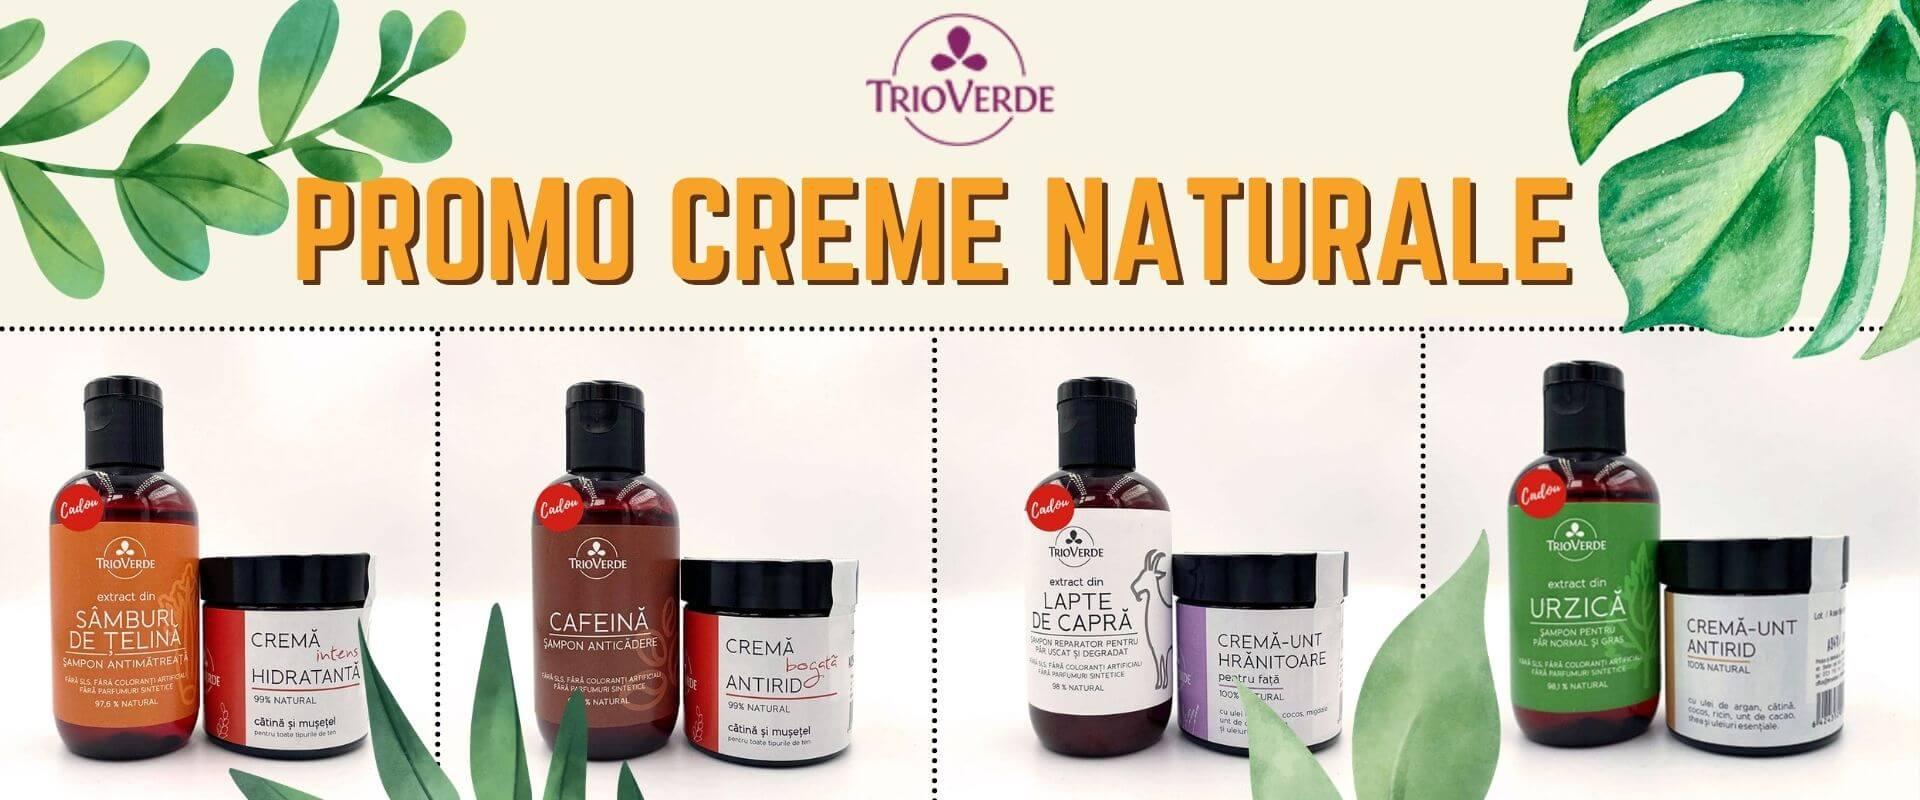 Promo creme naturale pentru ten Trio Verde